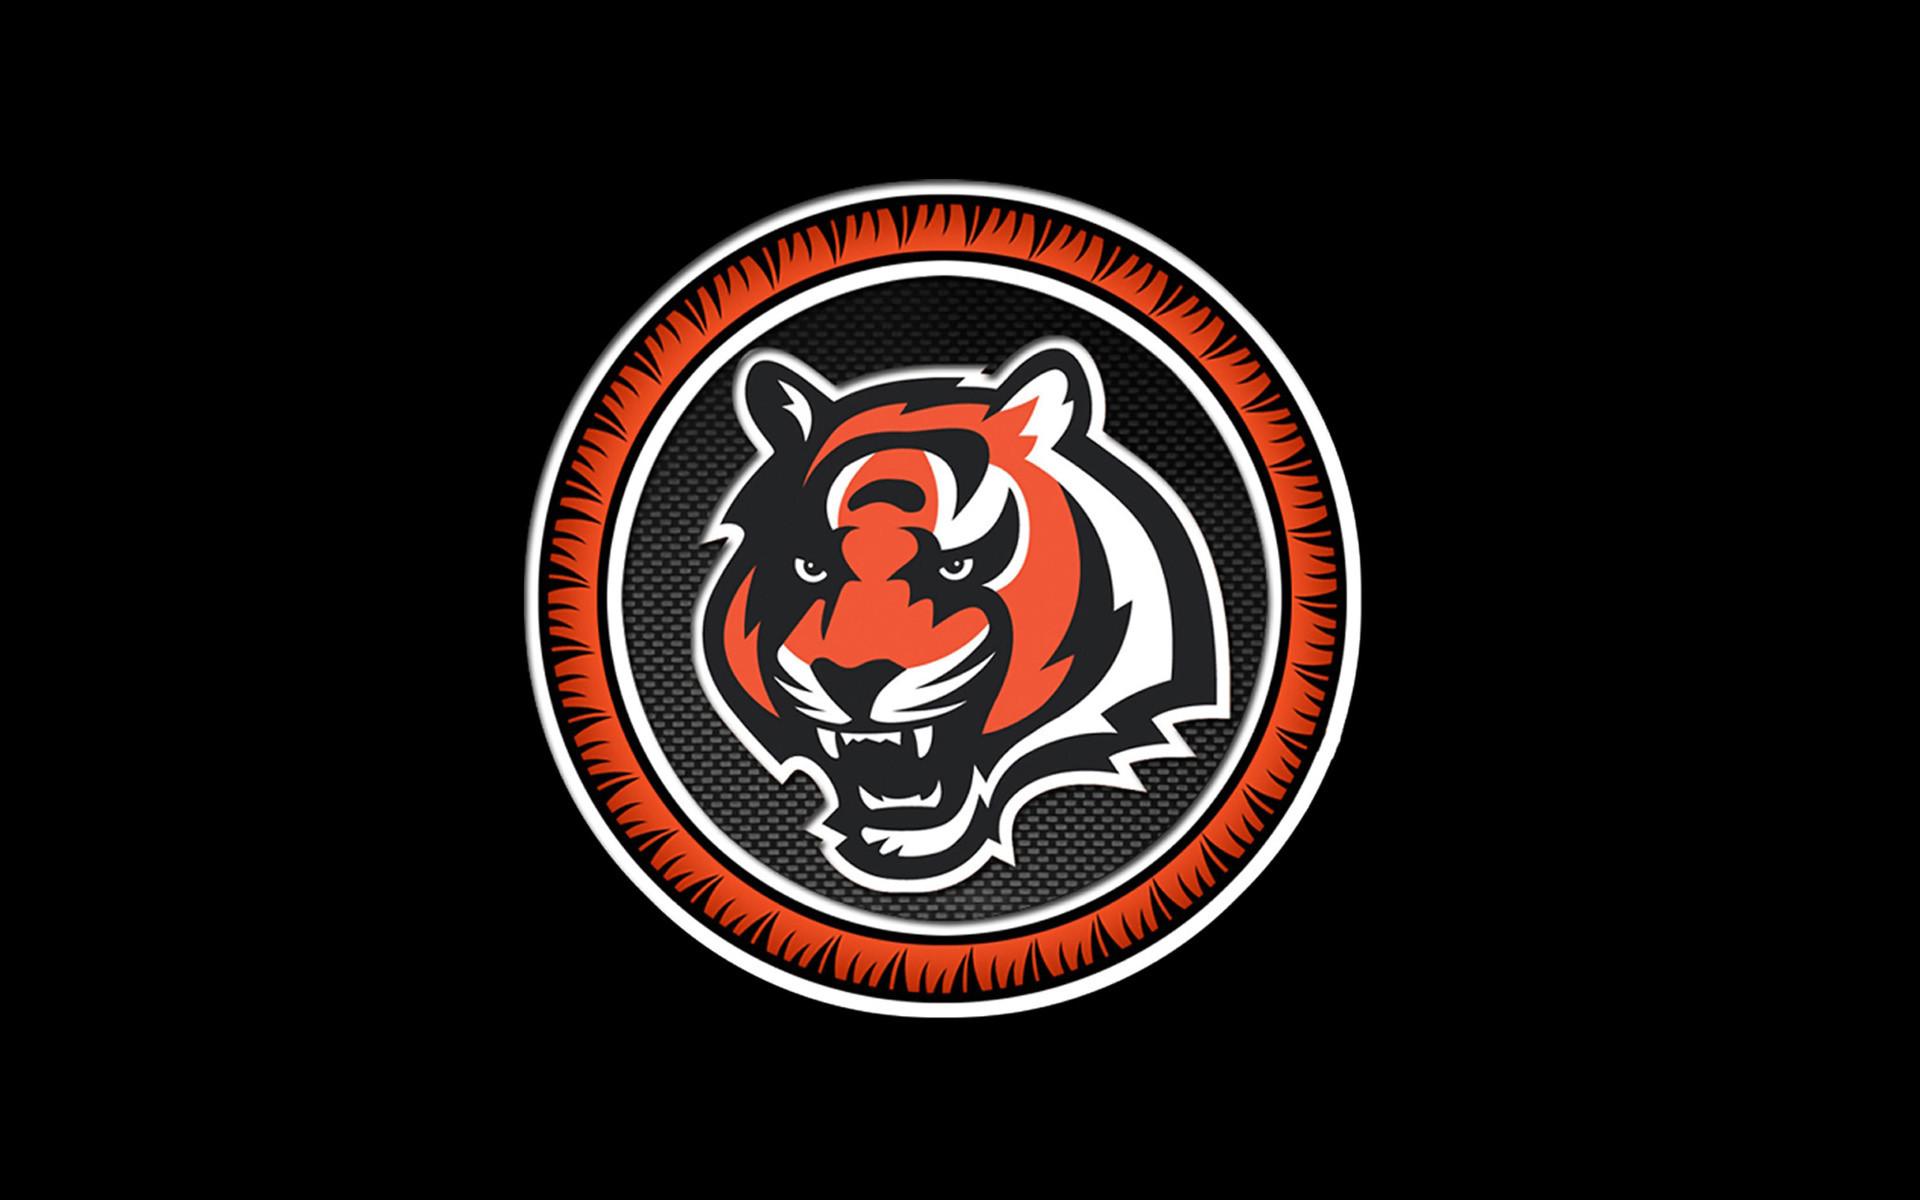 Bengals logo NFL Cool Wallpapers HD 1920×1200.jpg?m=1435337167